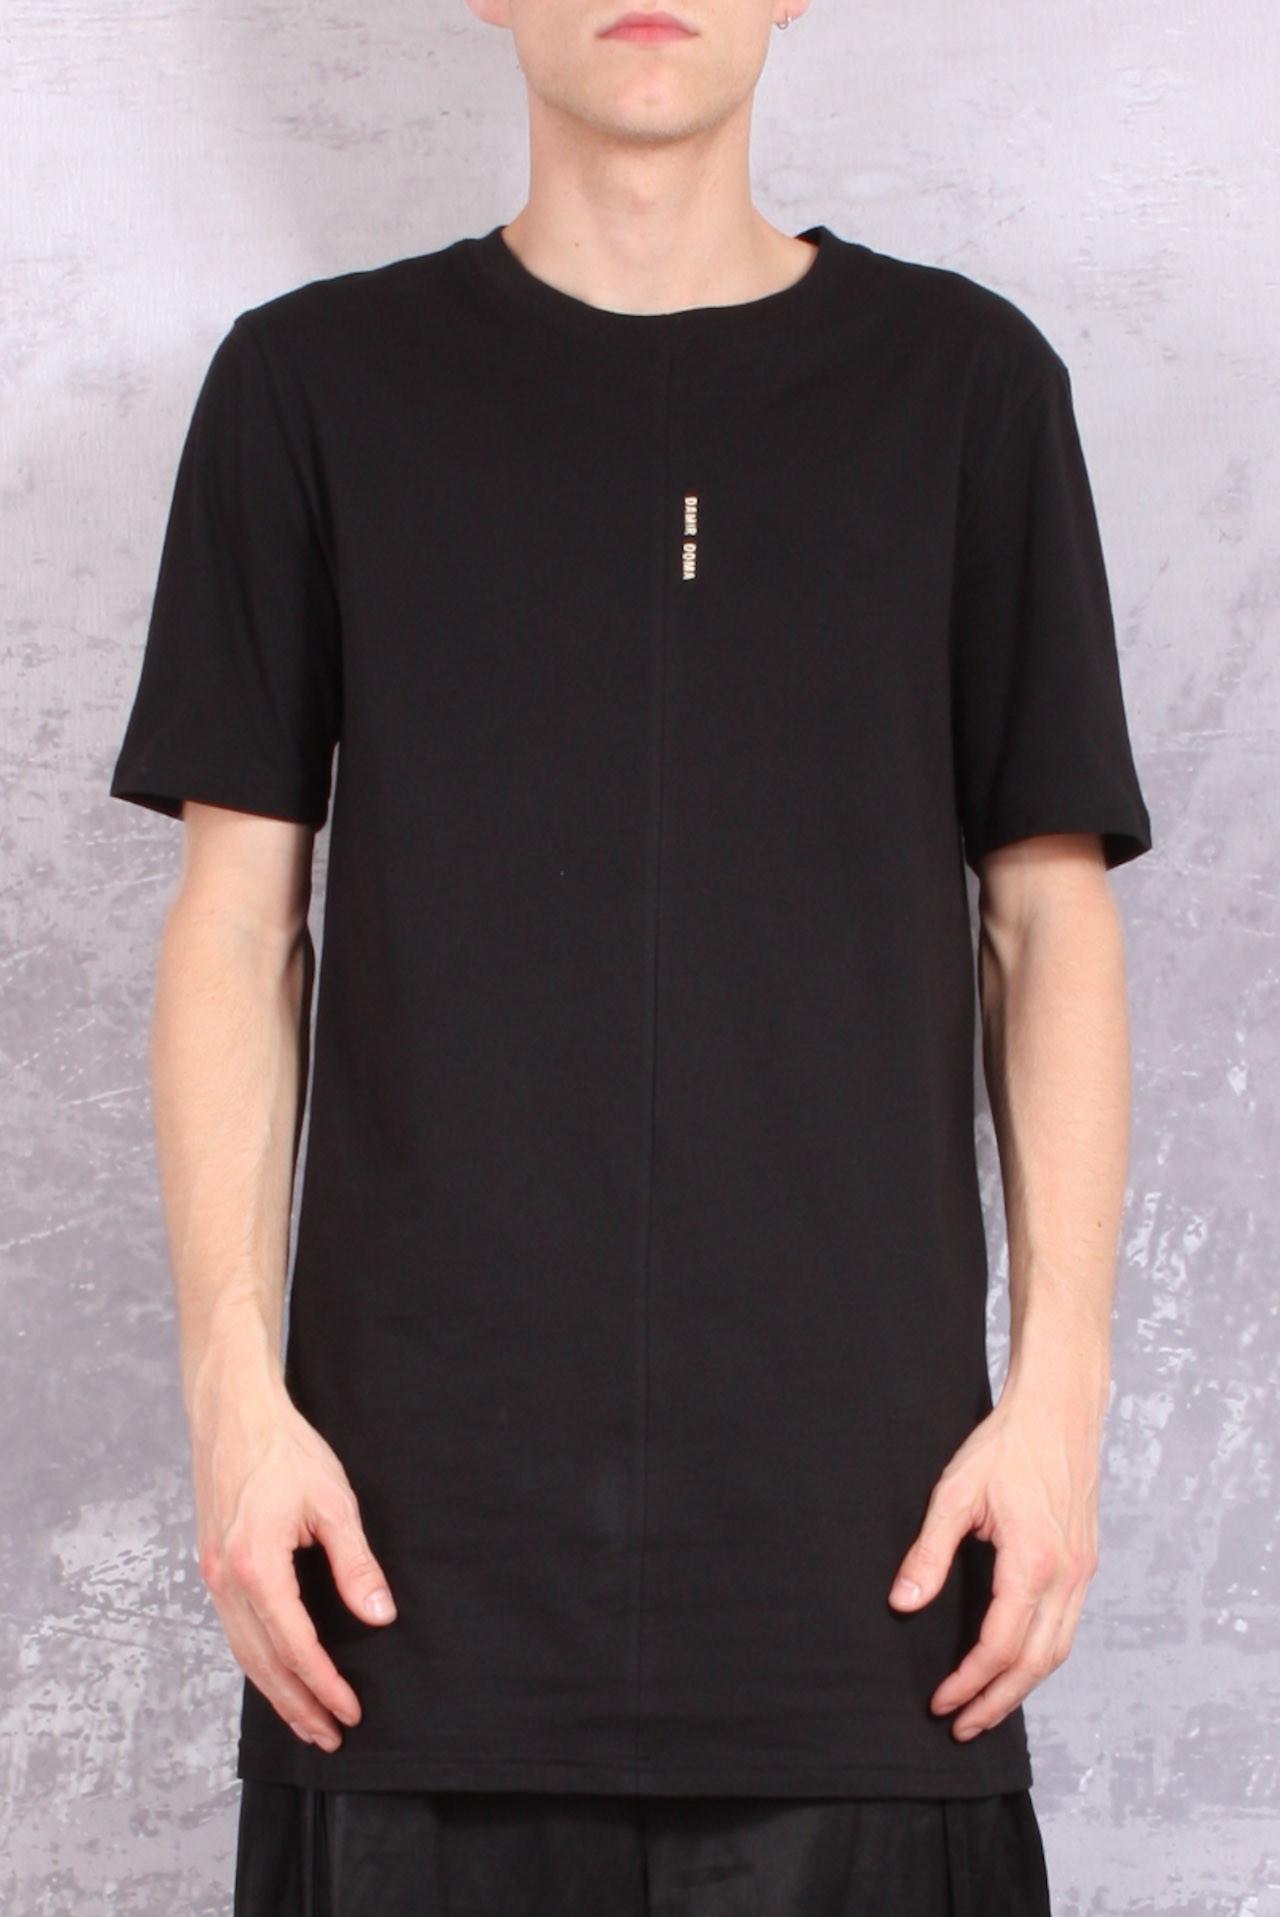 Damir Doma t-shirt